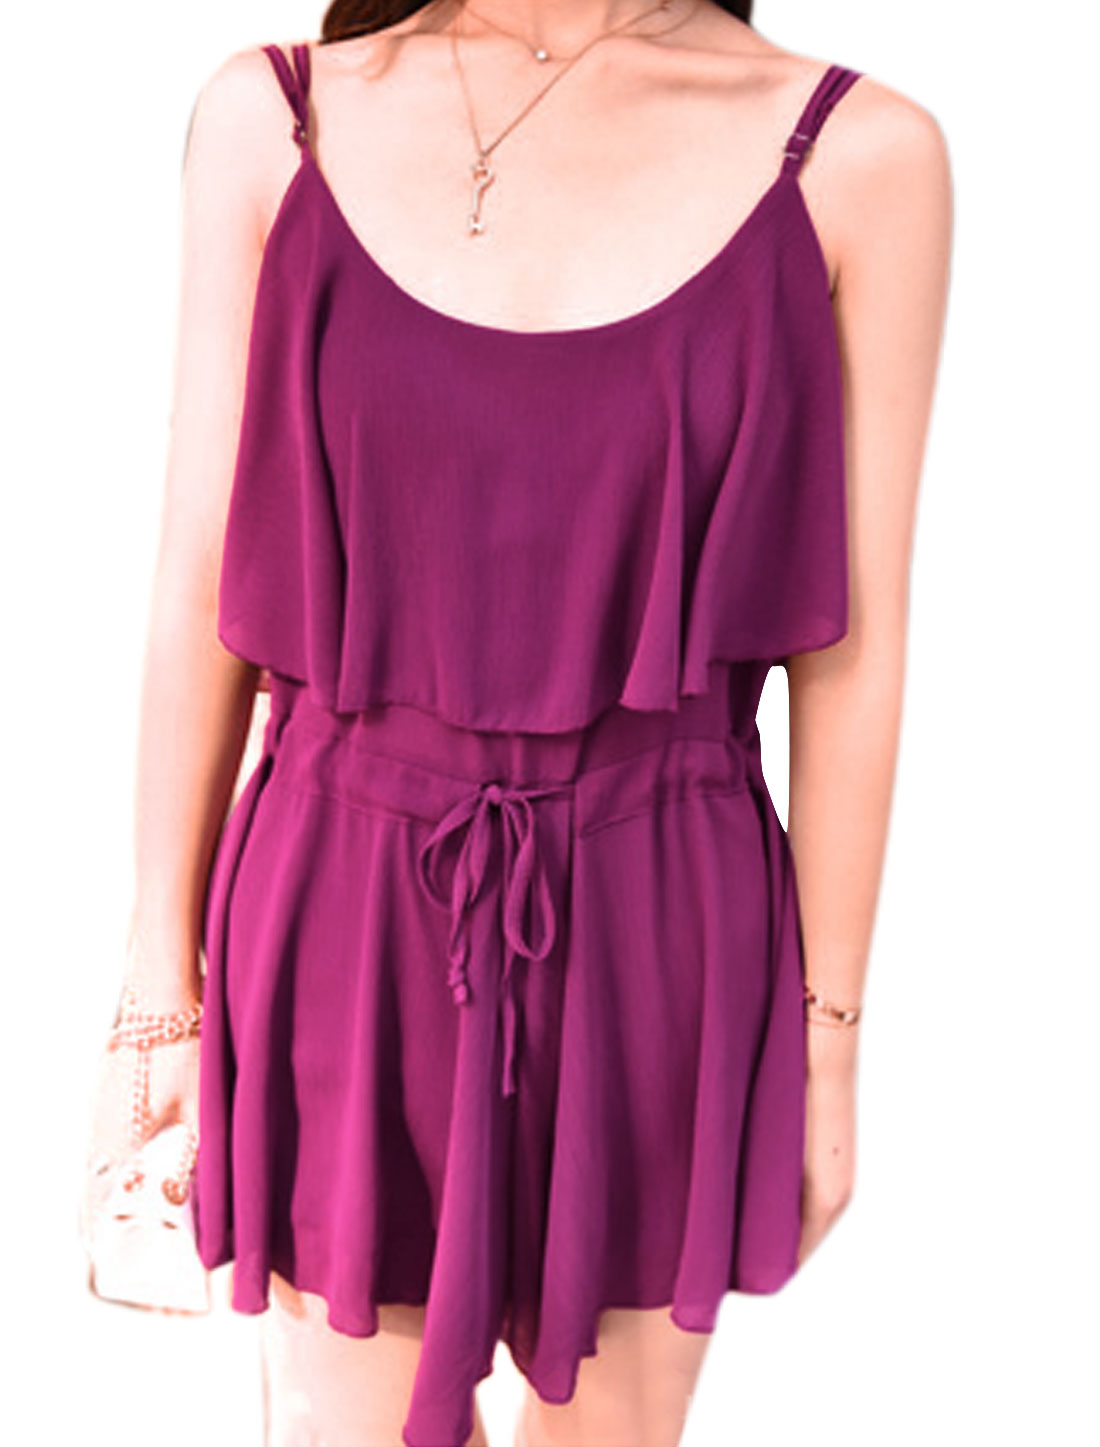 Women Scoop Neck Sleeveless Adjustable Straps Chiffon Rompers Purple XS